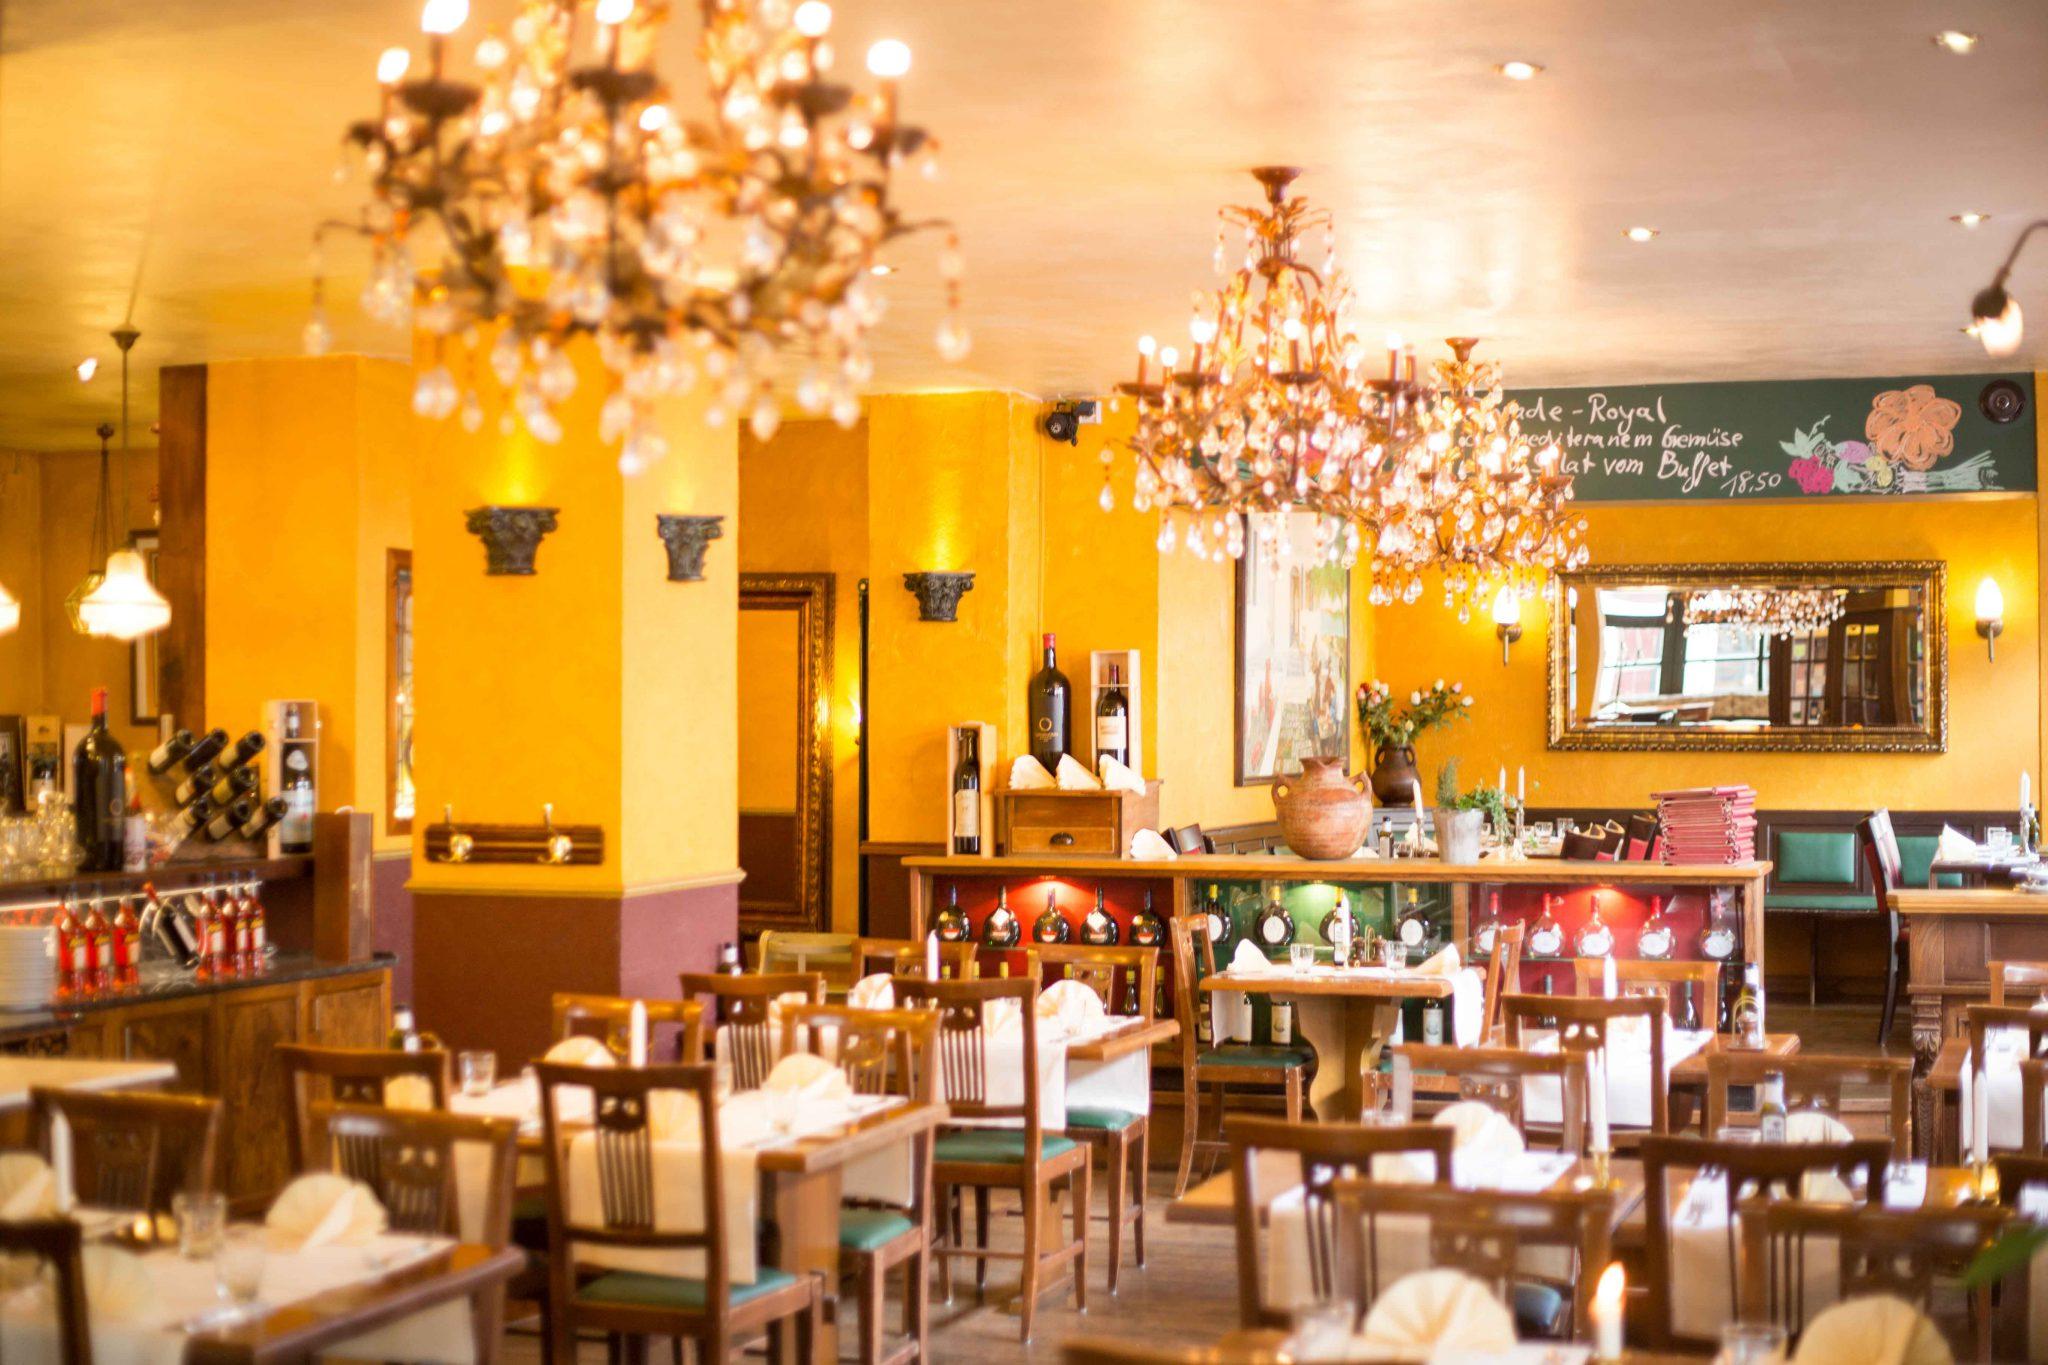 Anesis – Griechisches Restaurant in Hannover